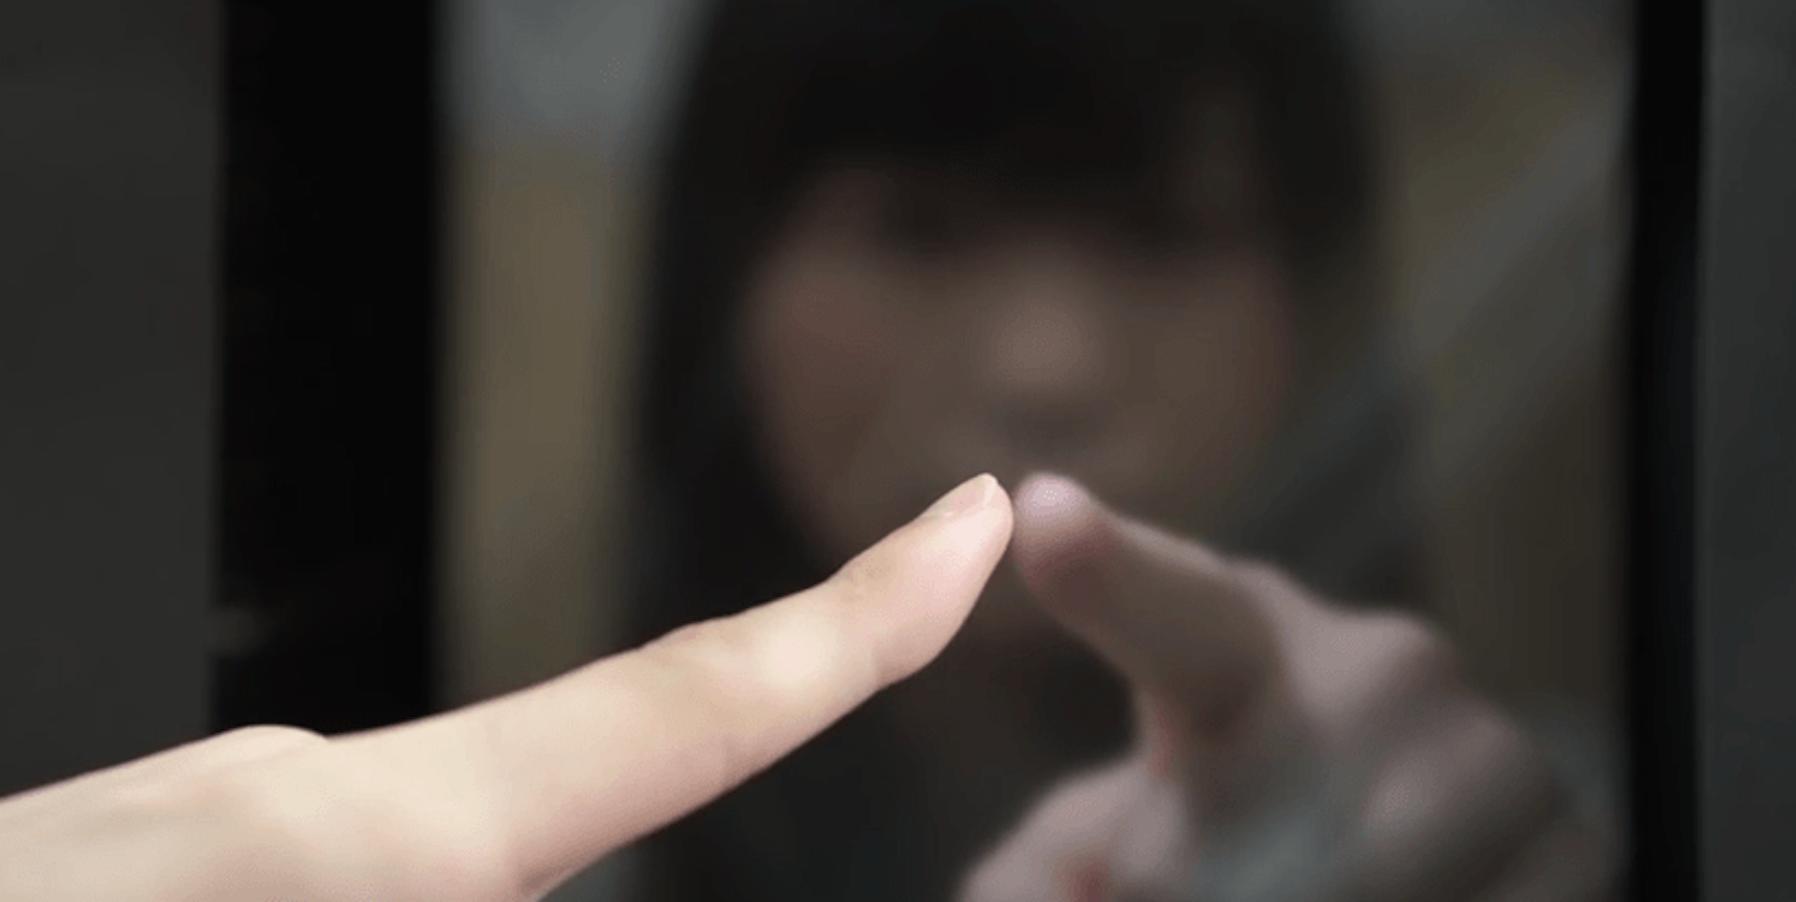 A screenshot from the Haptoclone demonstration video. http://www.hapis.k.u-tokyo.ac.jp/?portfolio=haptoclone&lang=en